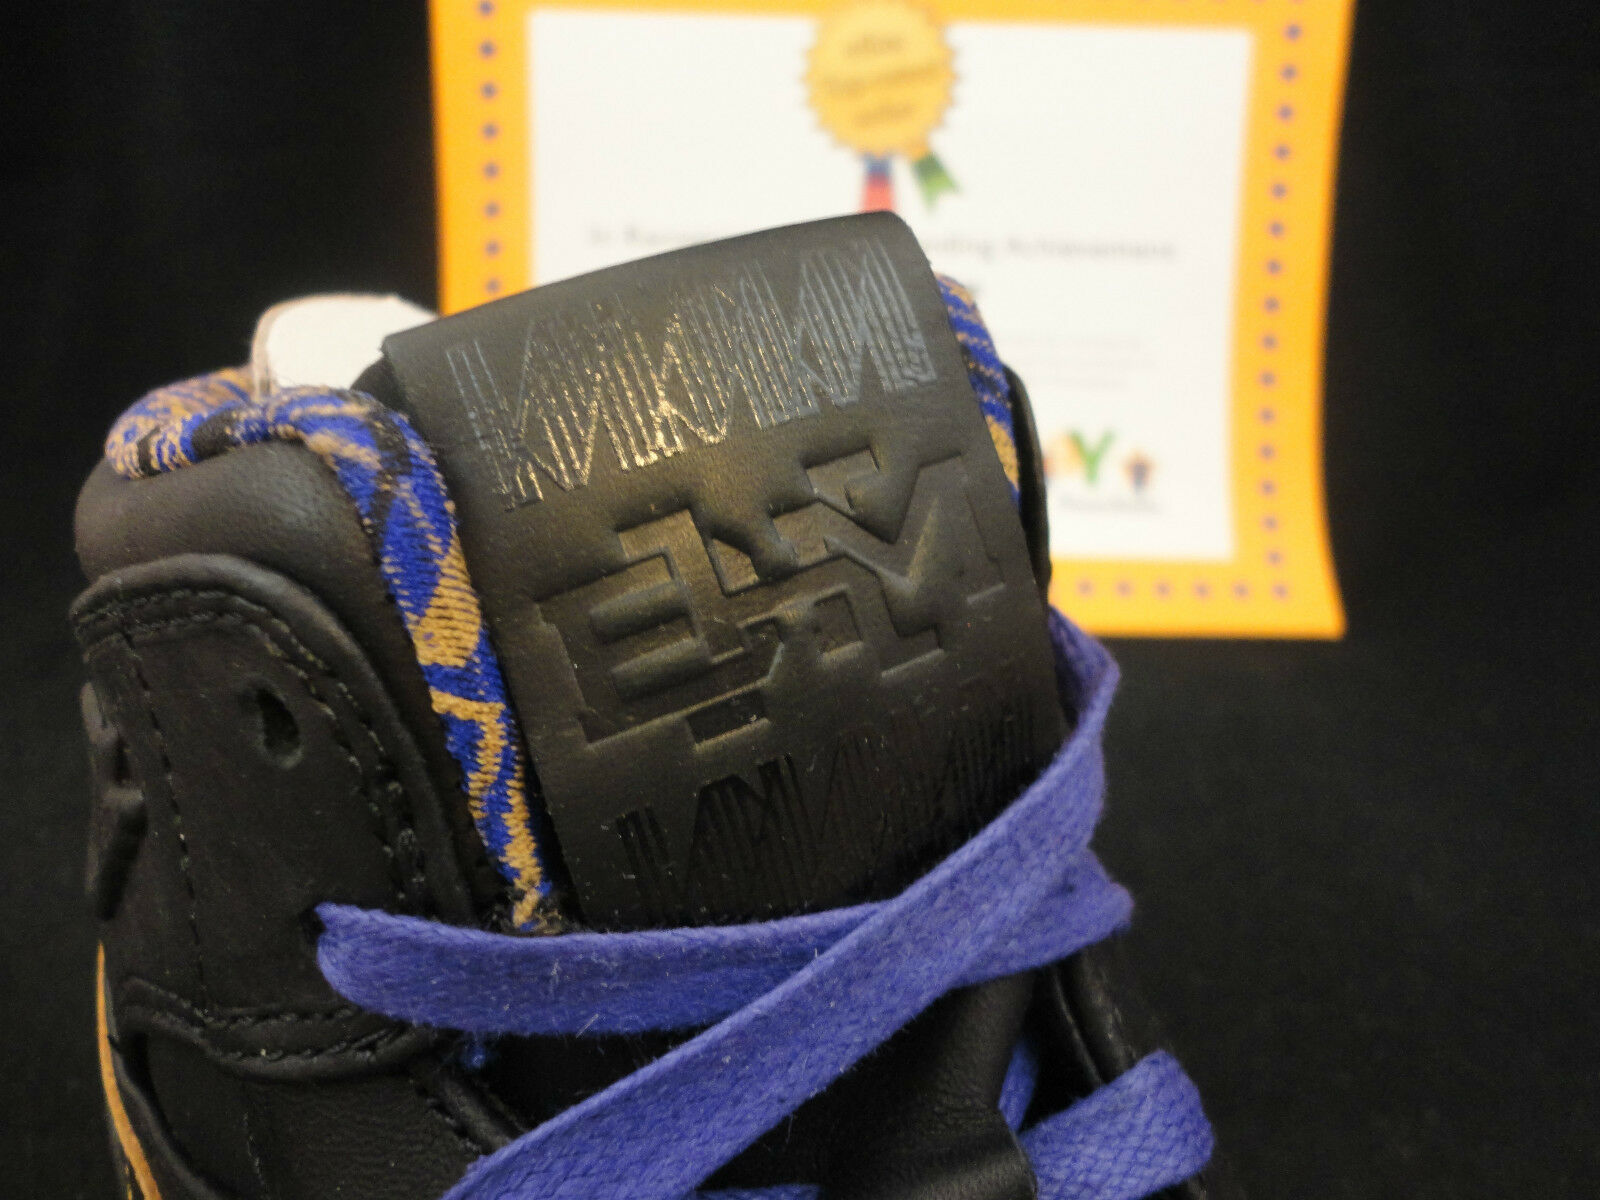 Nike air jordan 1 metà nouveau bhm, edizione limitata, numero 11